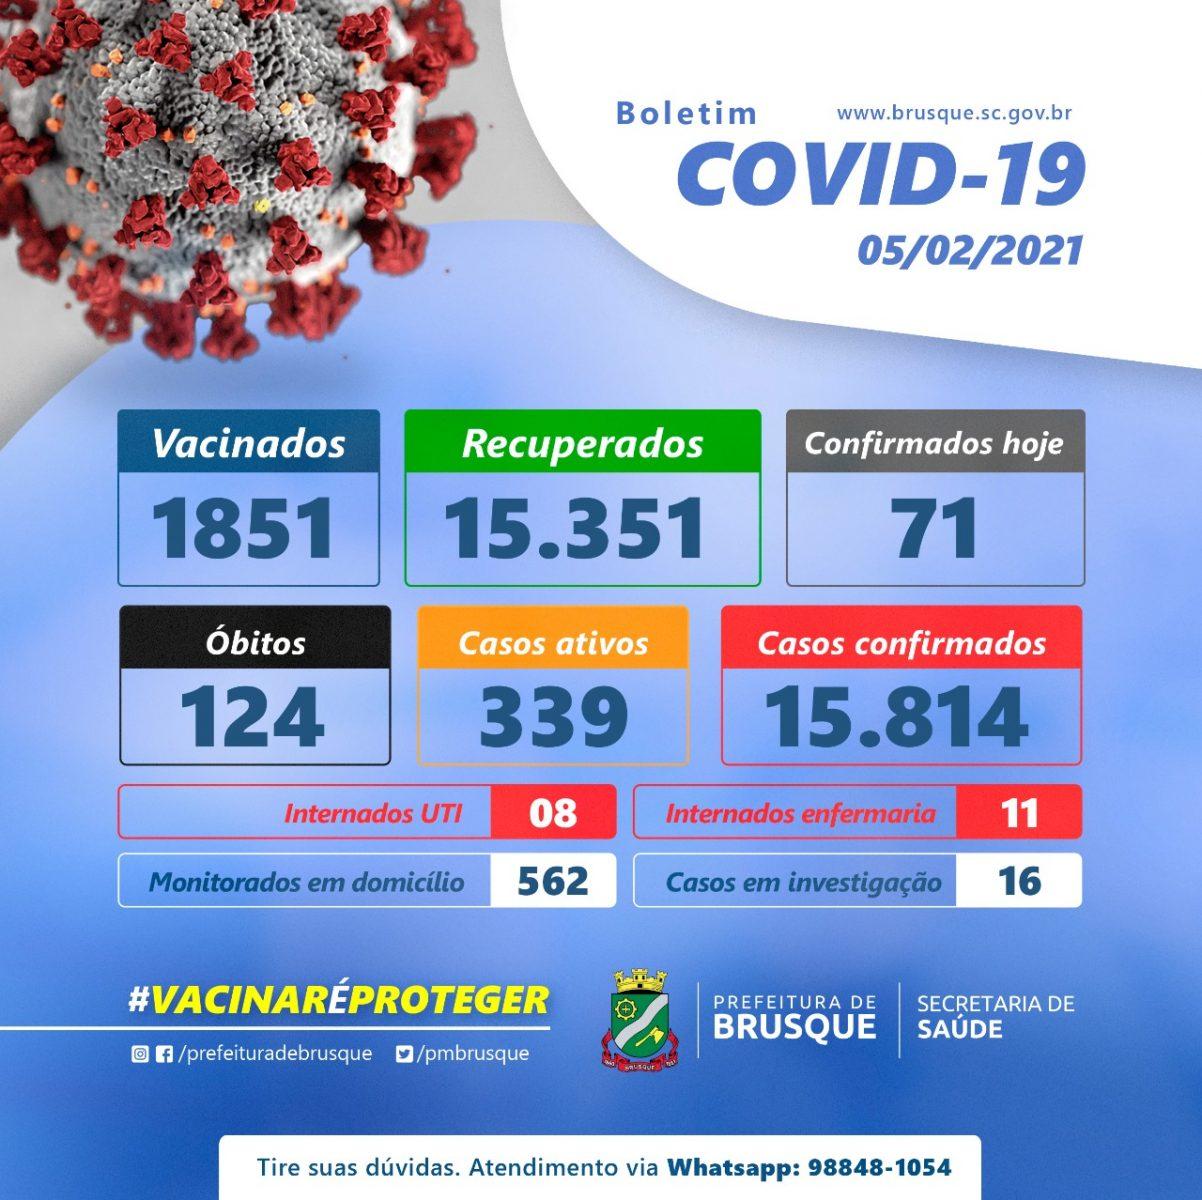 Covid-19: Confira o boletim epidemiológico desta sexta-feira (5)